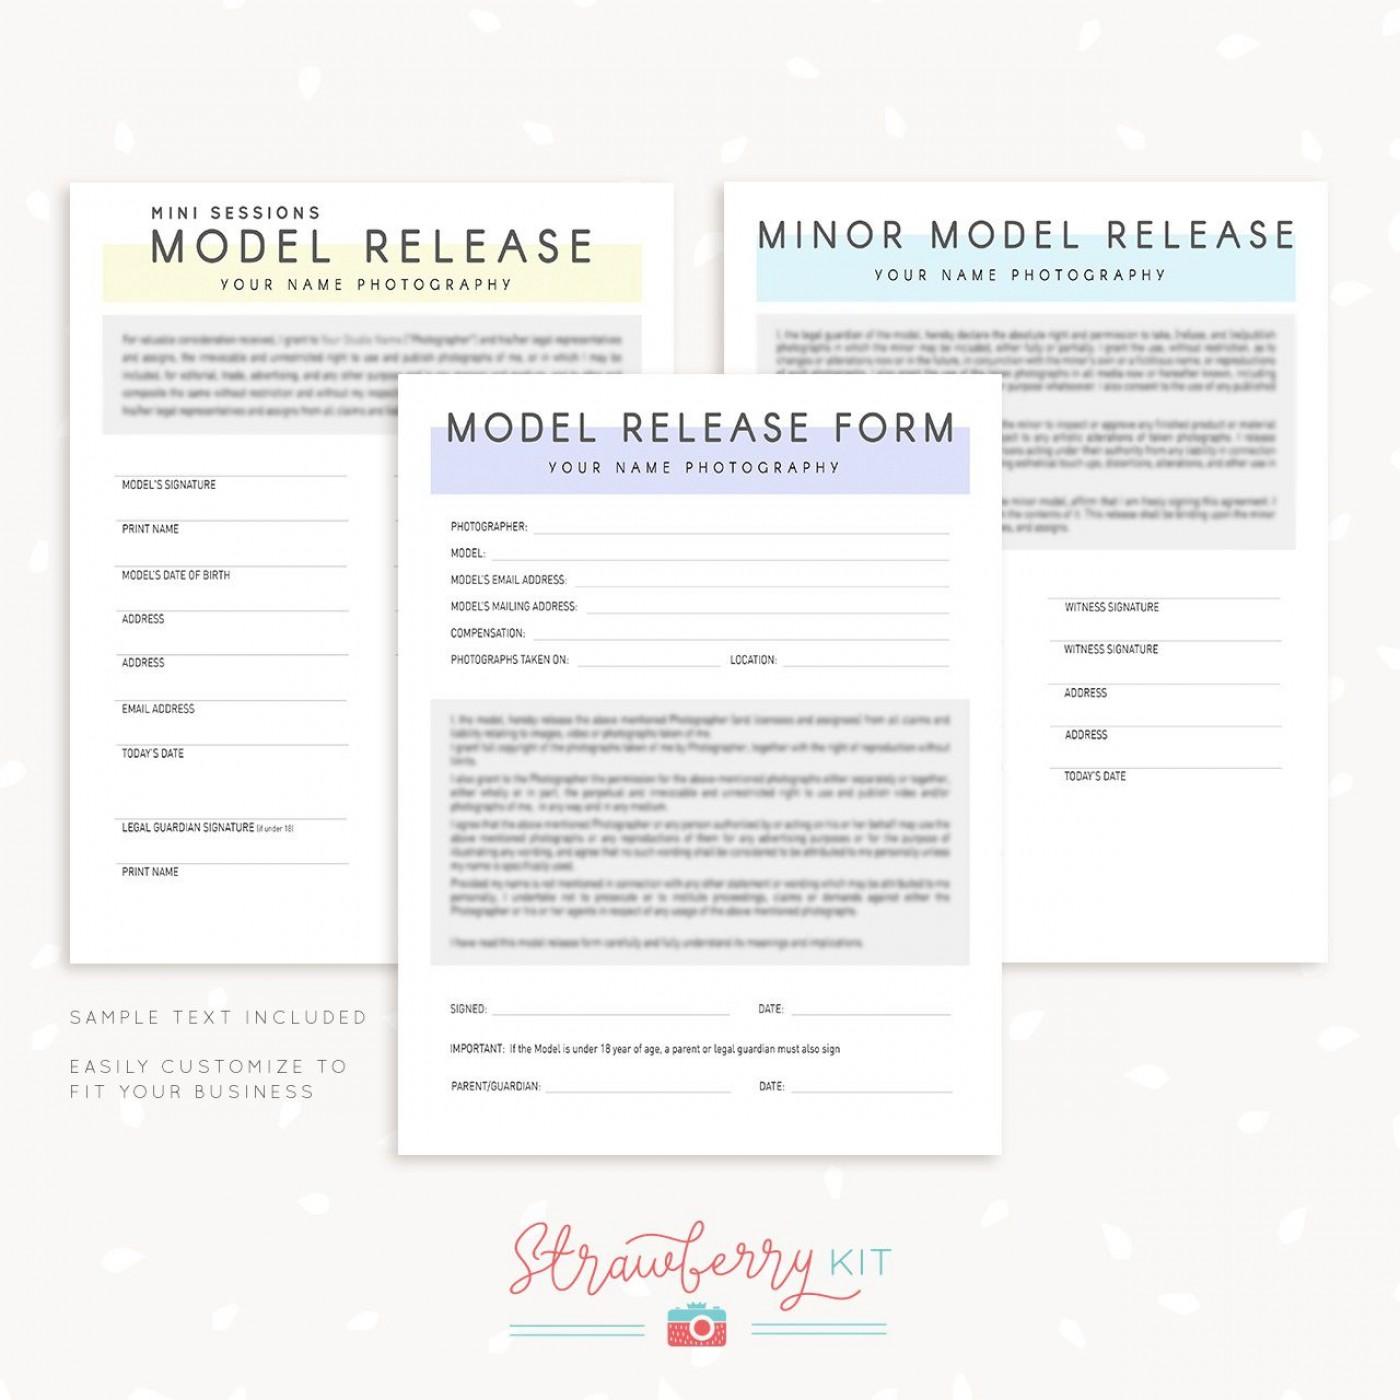 007 Wondrou Model Release Form Template Picture  Photographer Gdpr Simple1400